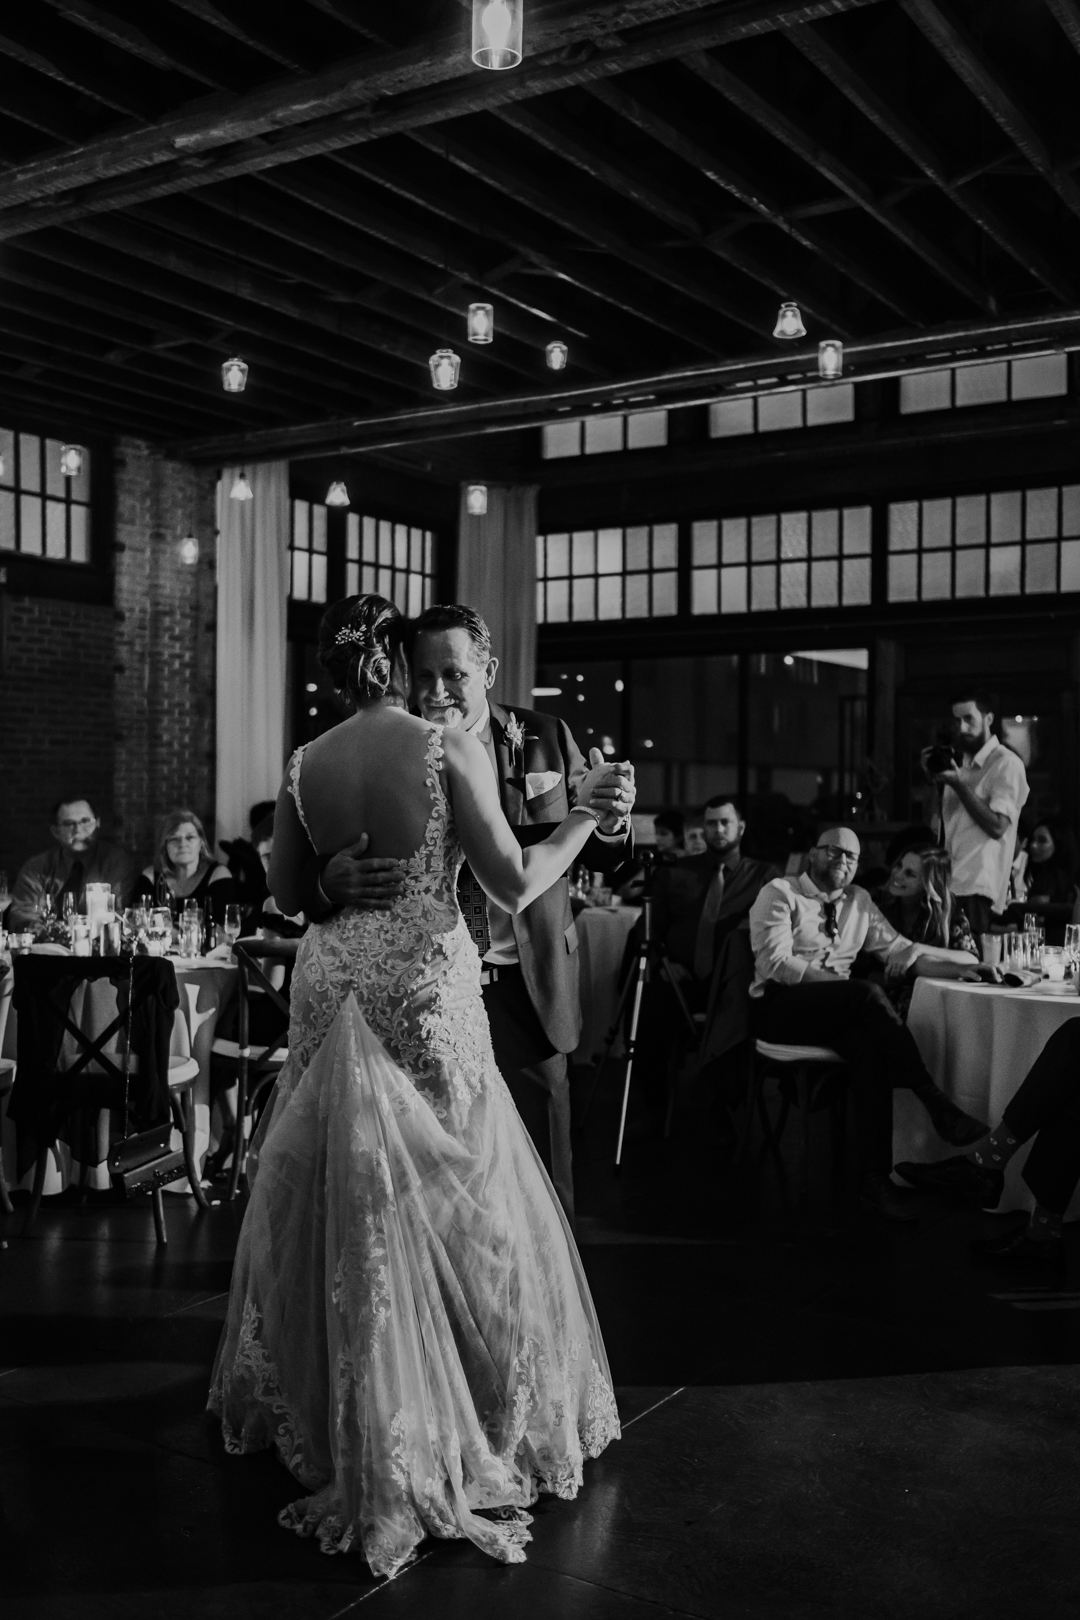 cavu-tampa-wedding-charlie-lauren-107.jpg